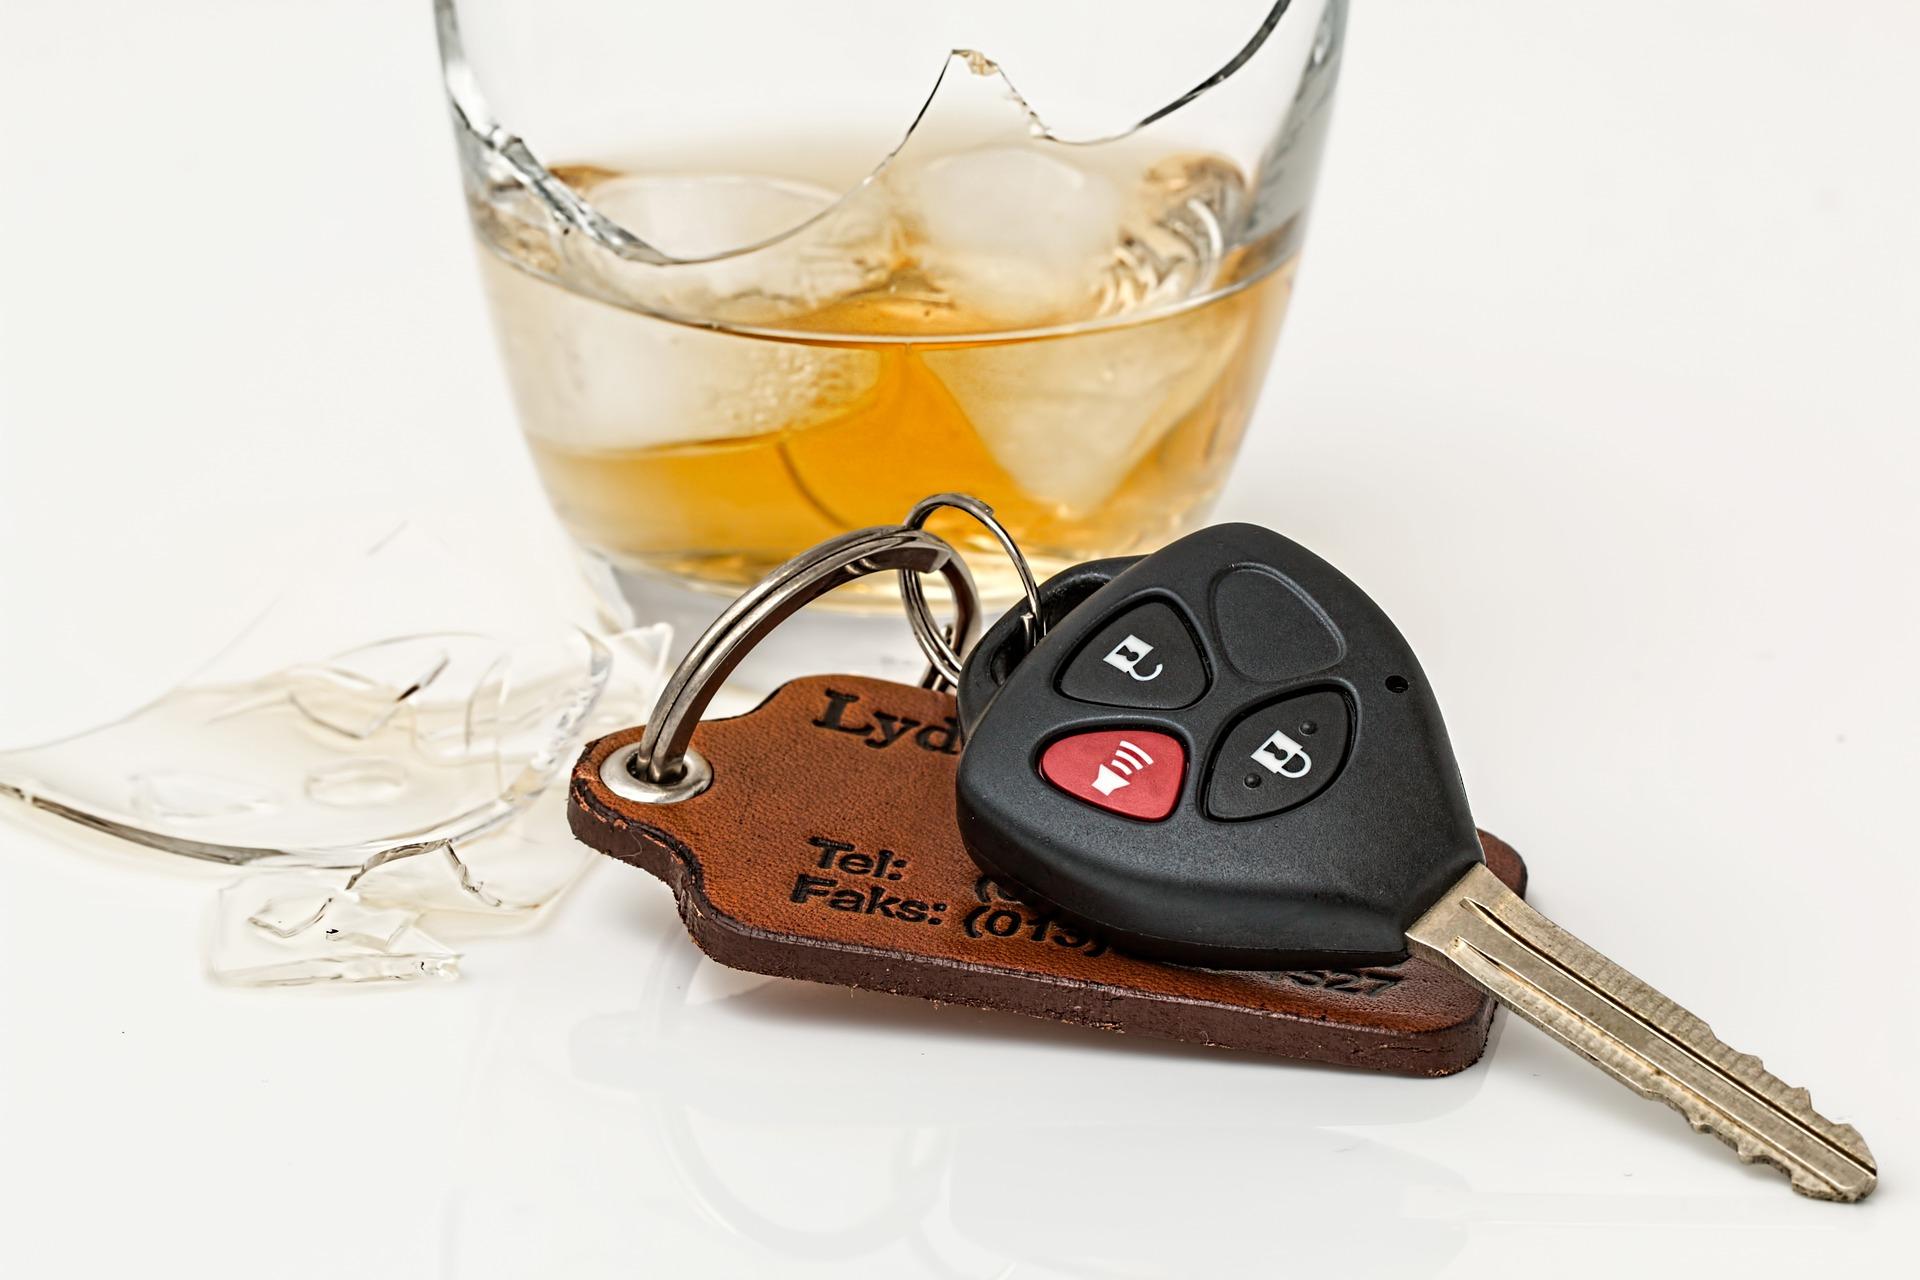 Reclamación de indemnización por accidente de tráfico con alcohol Accidentes de tráfico Moratalla Abogados abogadodeaccidentesdetrafico.es